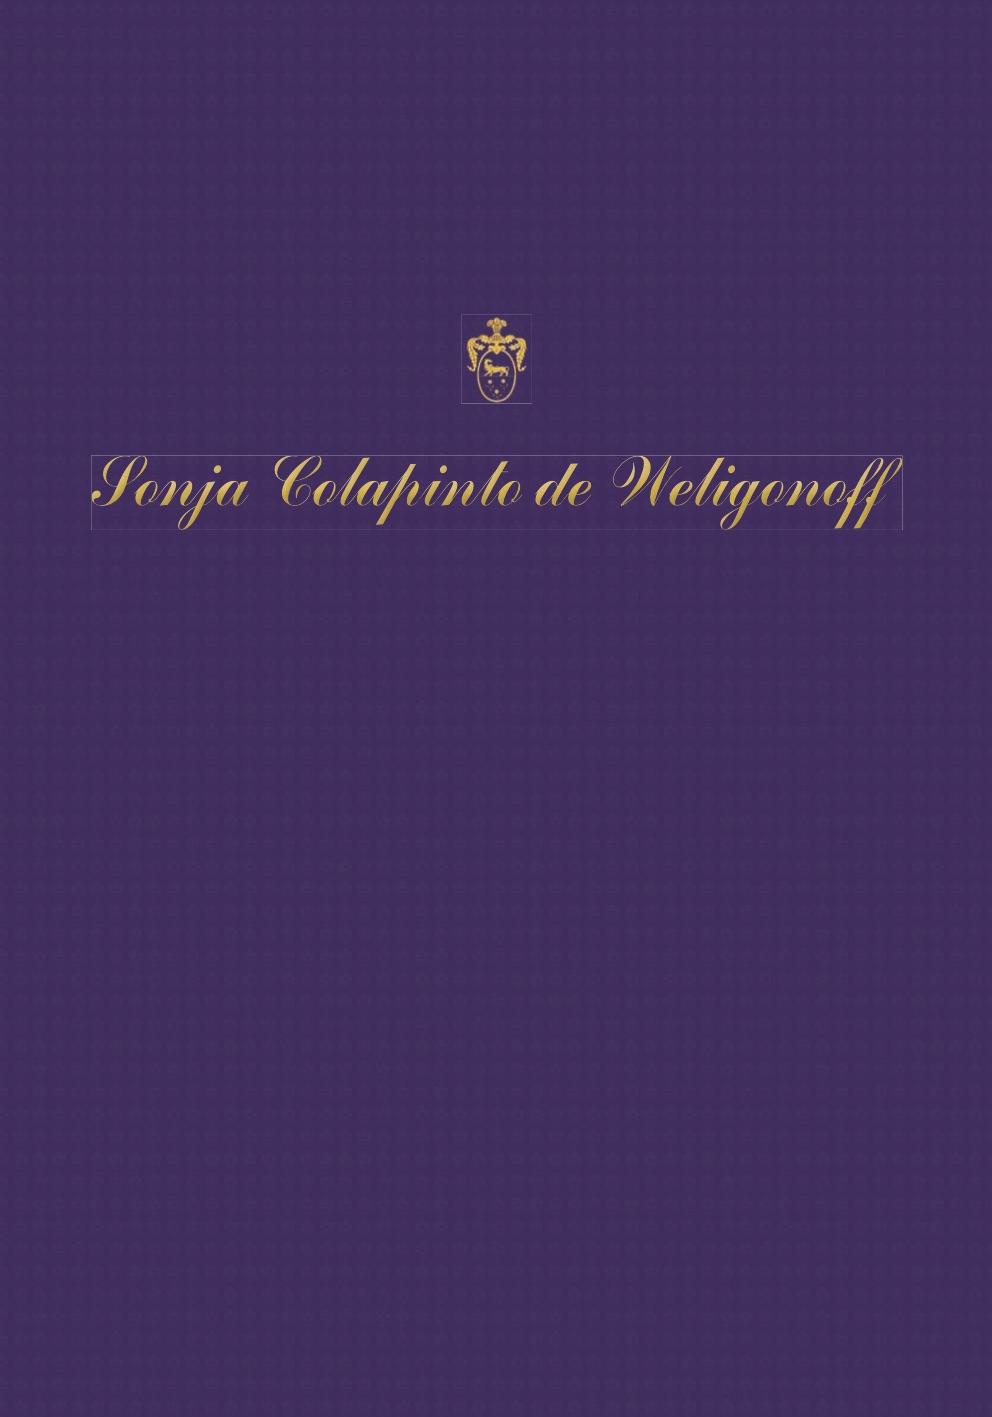 CATALOGO 2007-2013 SONJA COLAPINTO de WELIGONOFF